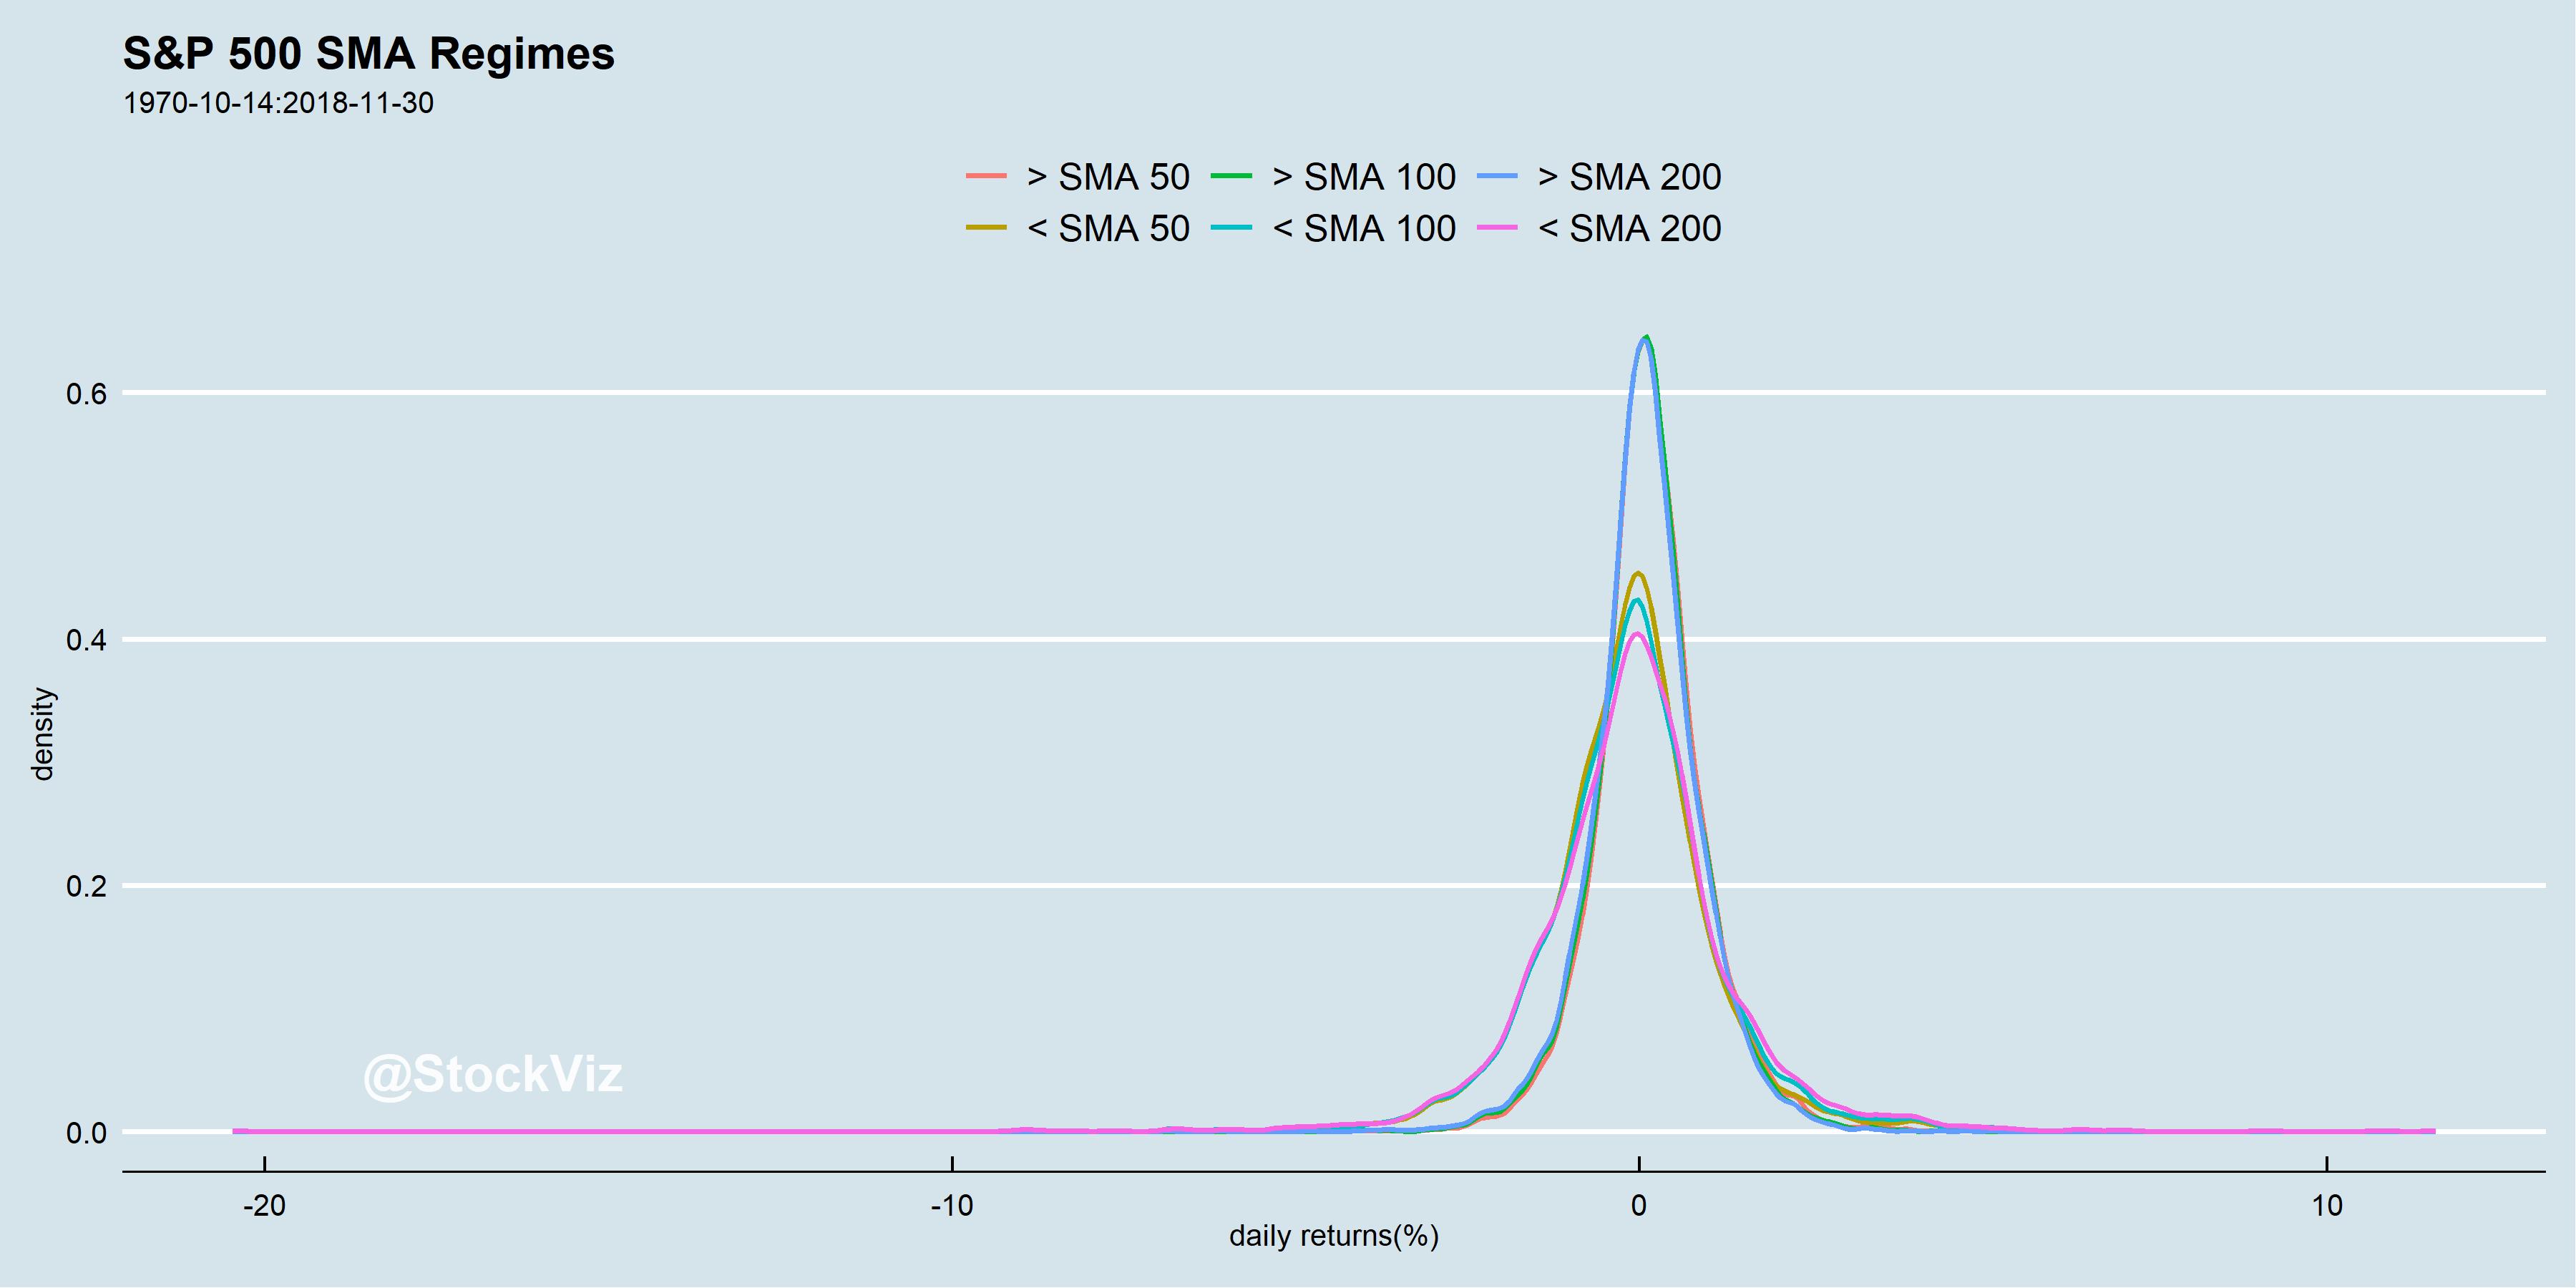 S&P 500 simple moving average returns density plot